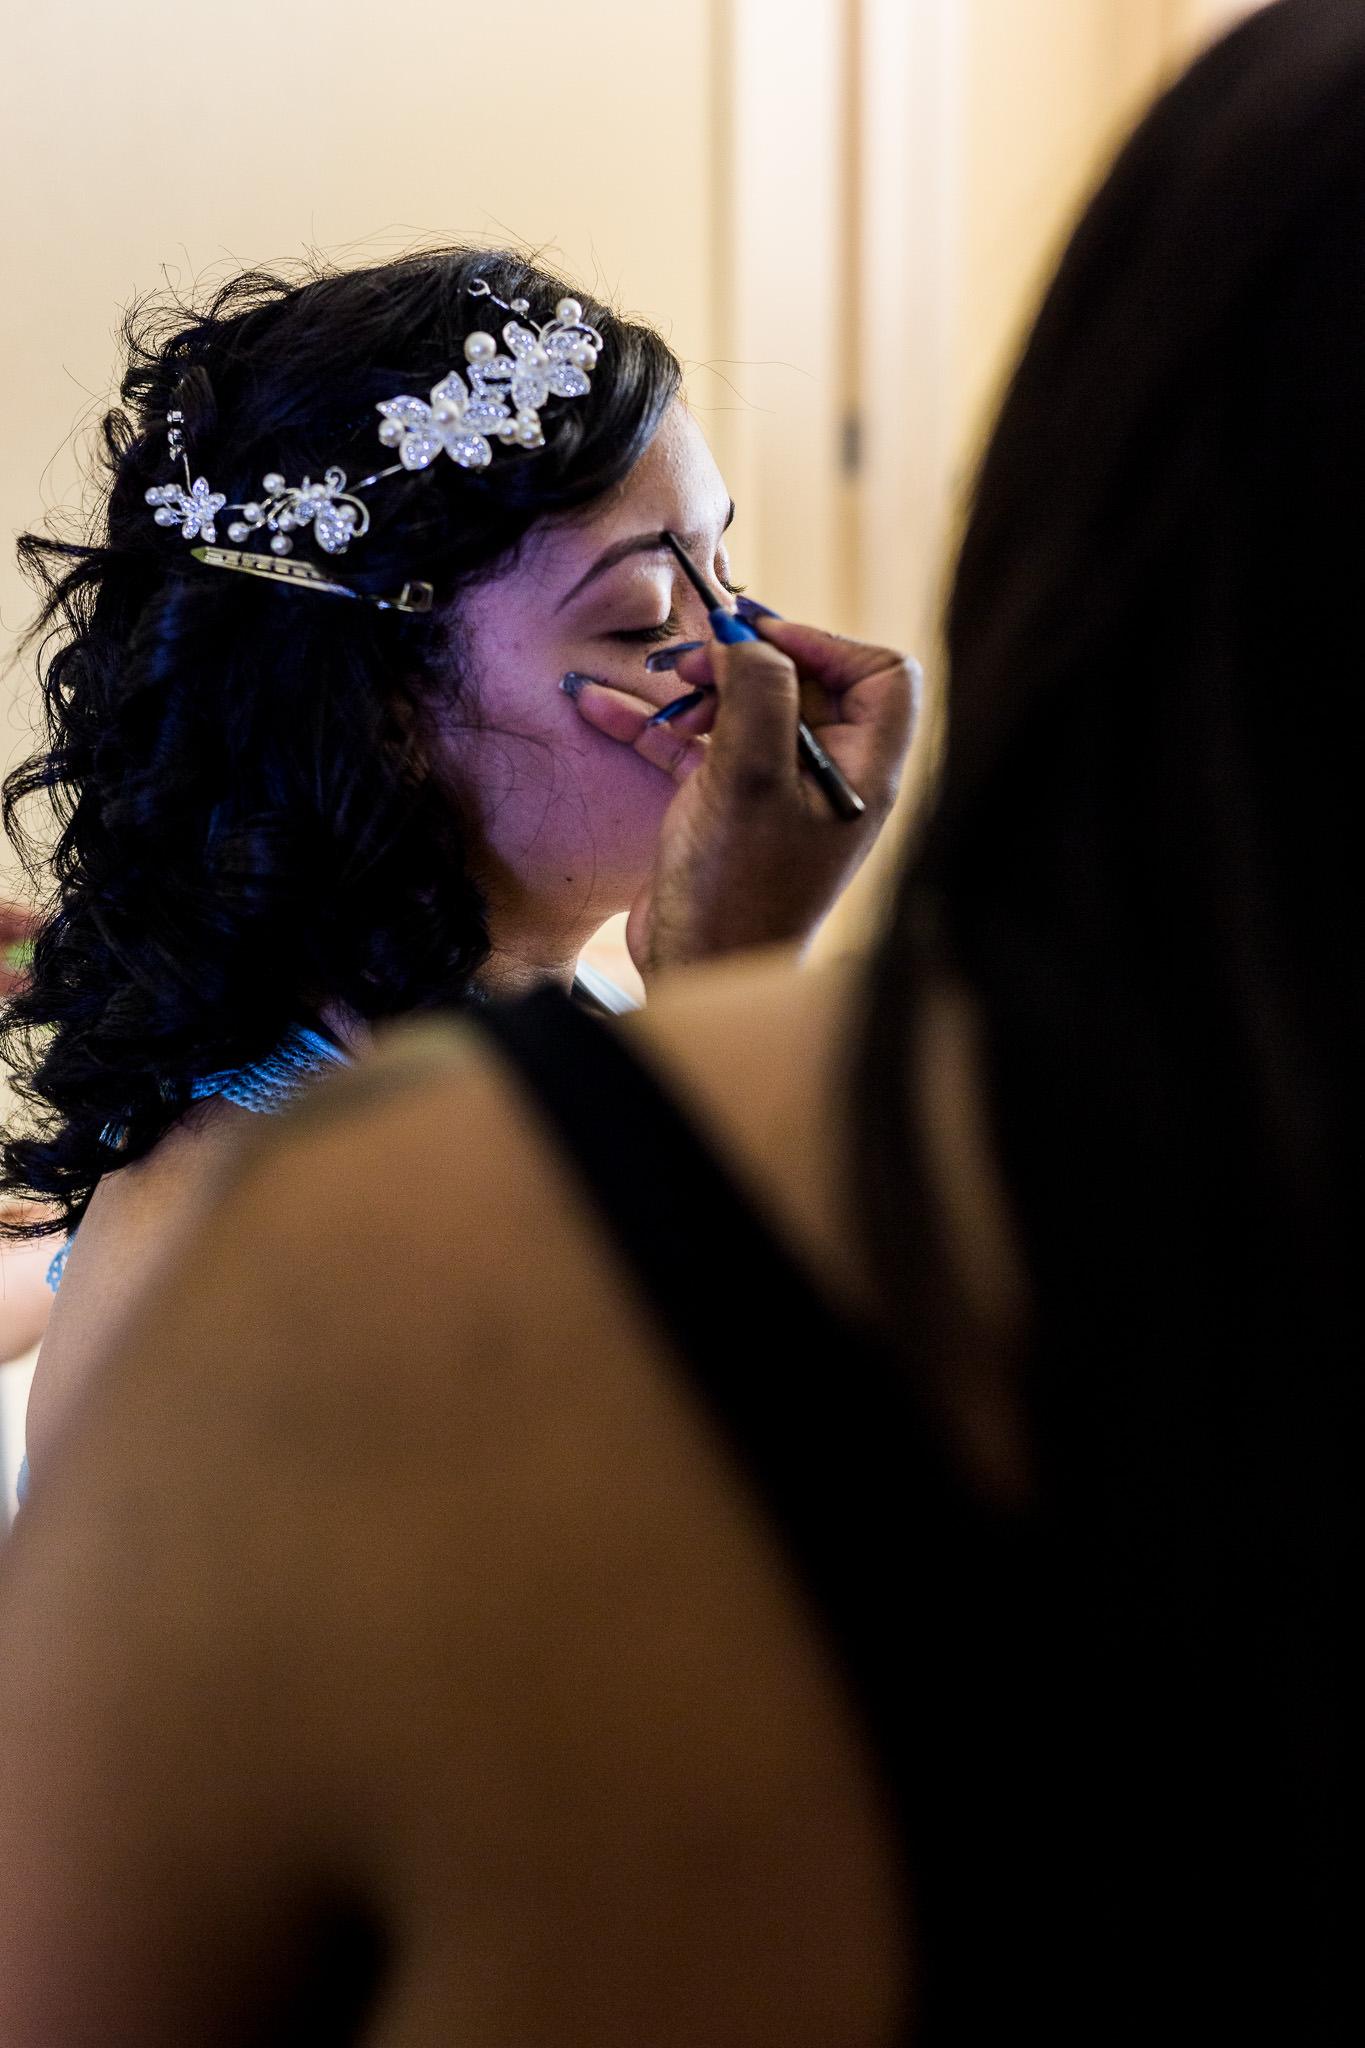 st-louis-photographer-cellar-222-wedding-3.jpg